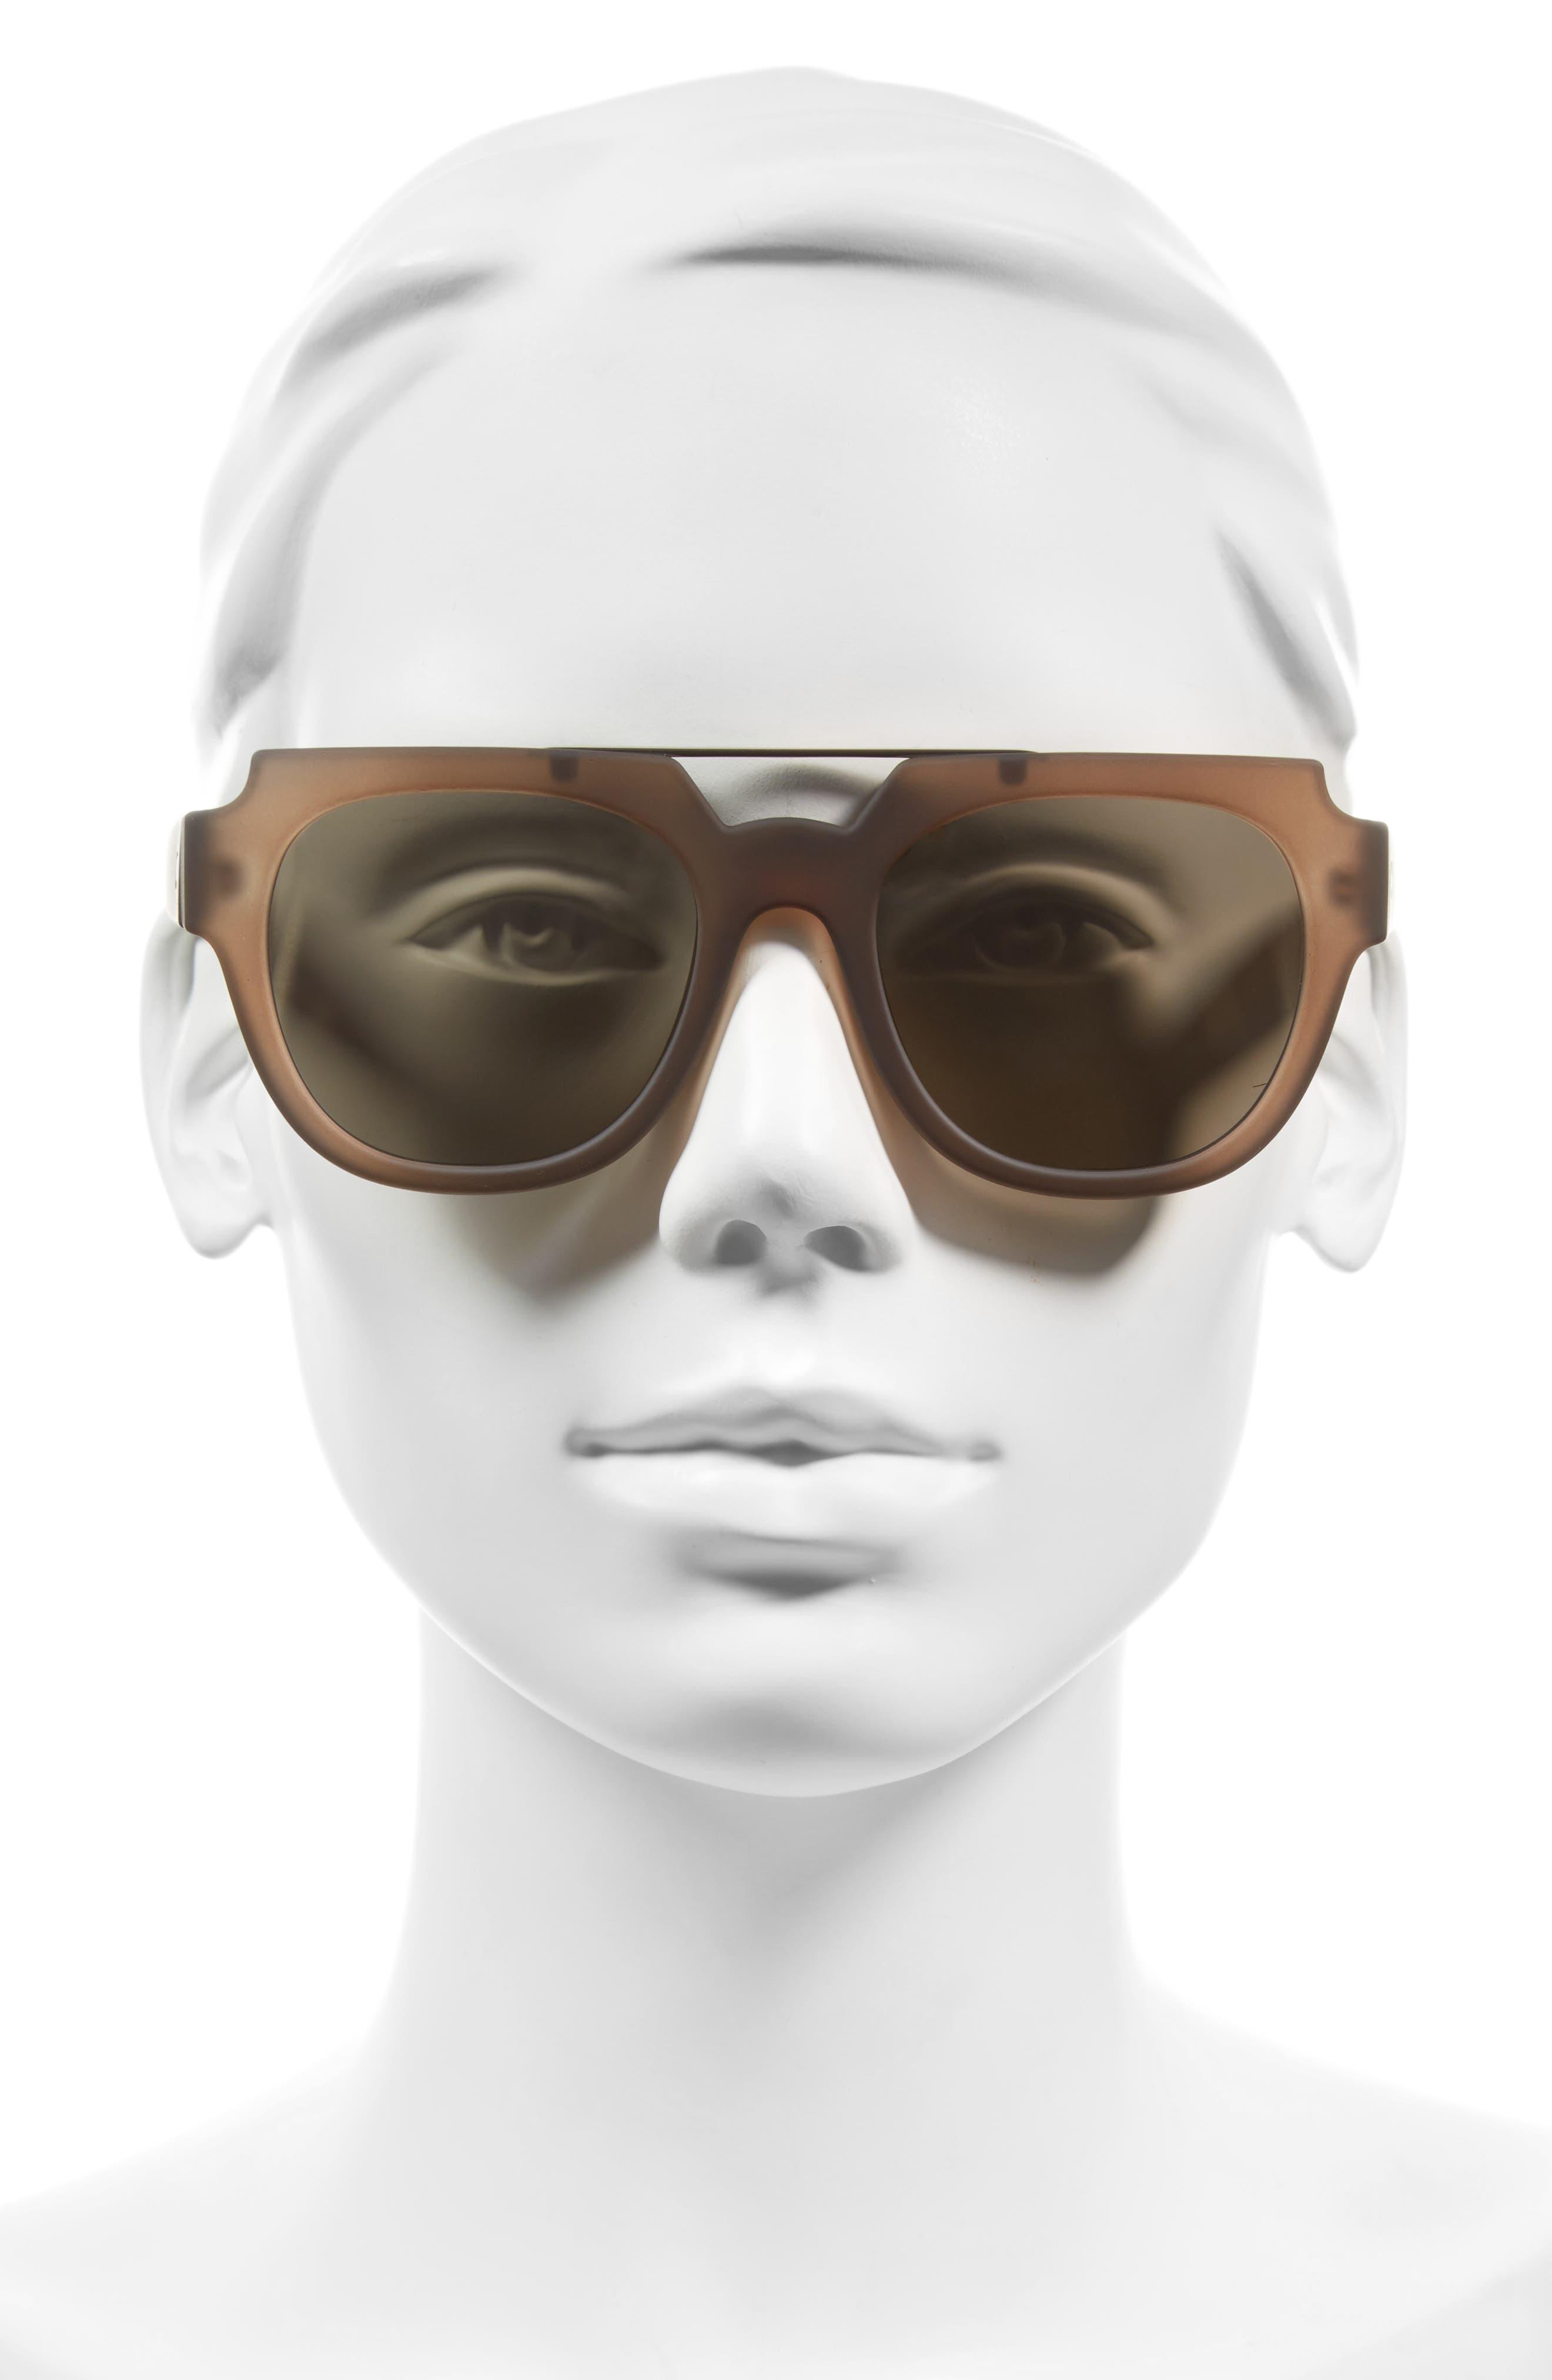 La Habana 52mm Retro Sunglasses,                             Alternate thumbnail 6, color,